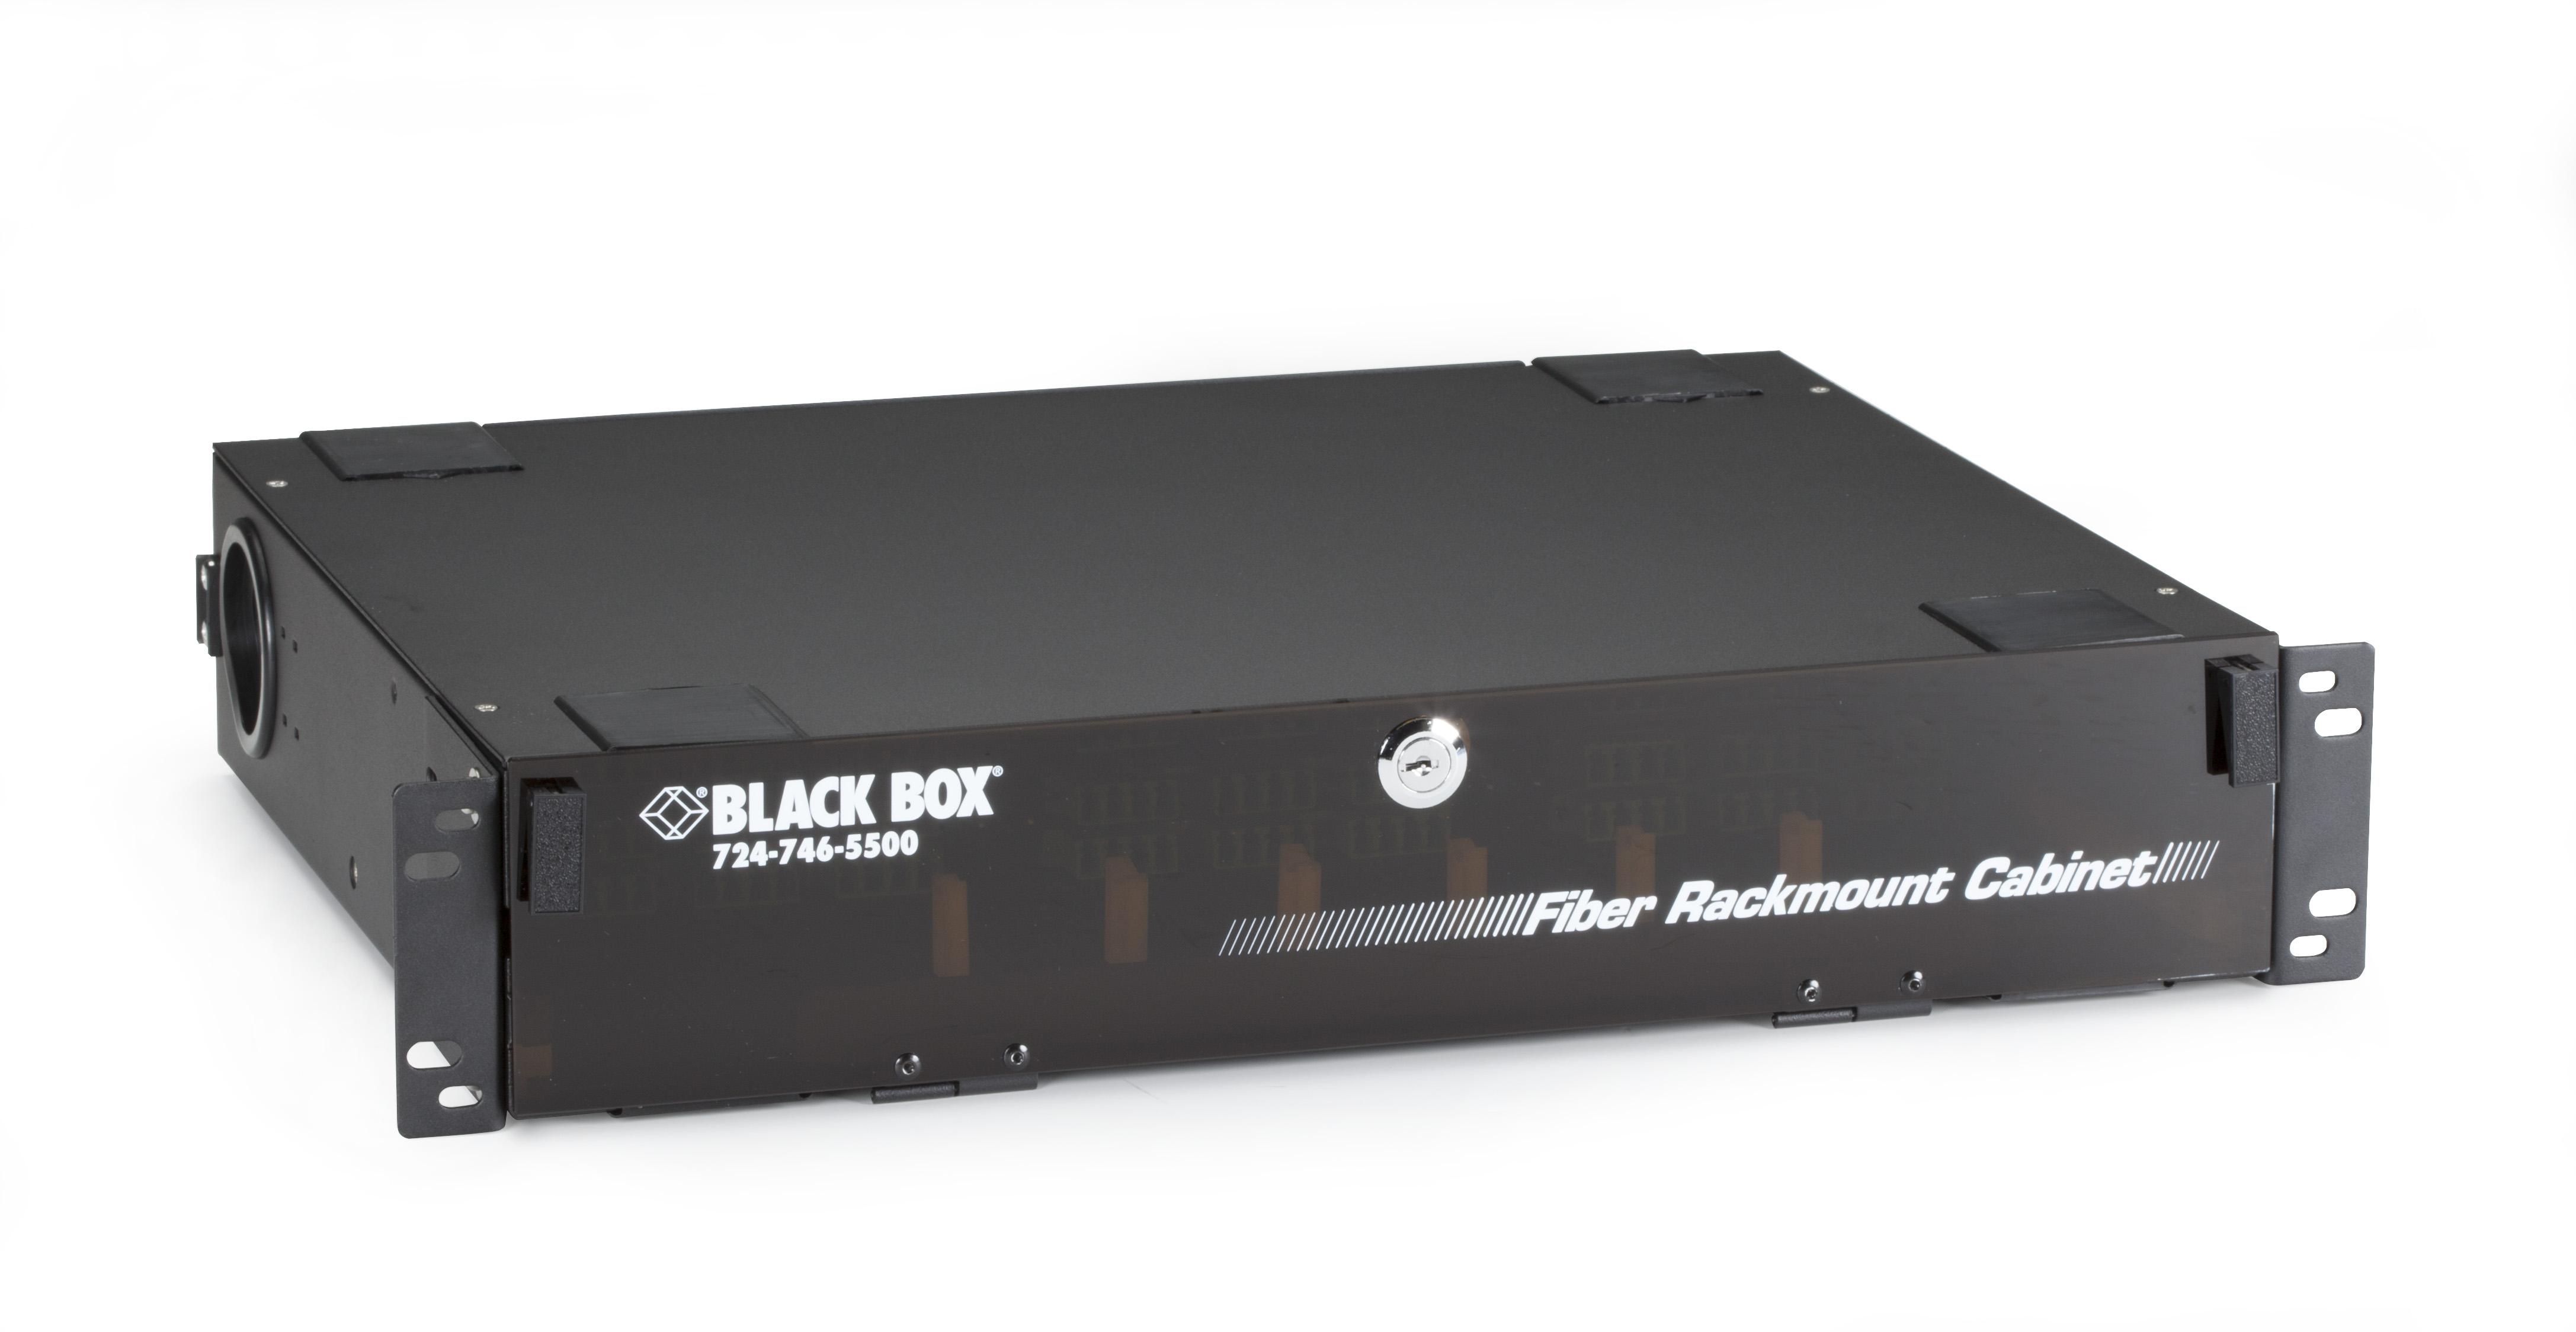 Rackmount Fiber Enclosure - 2U, 6-Panel